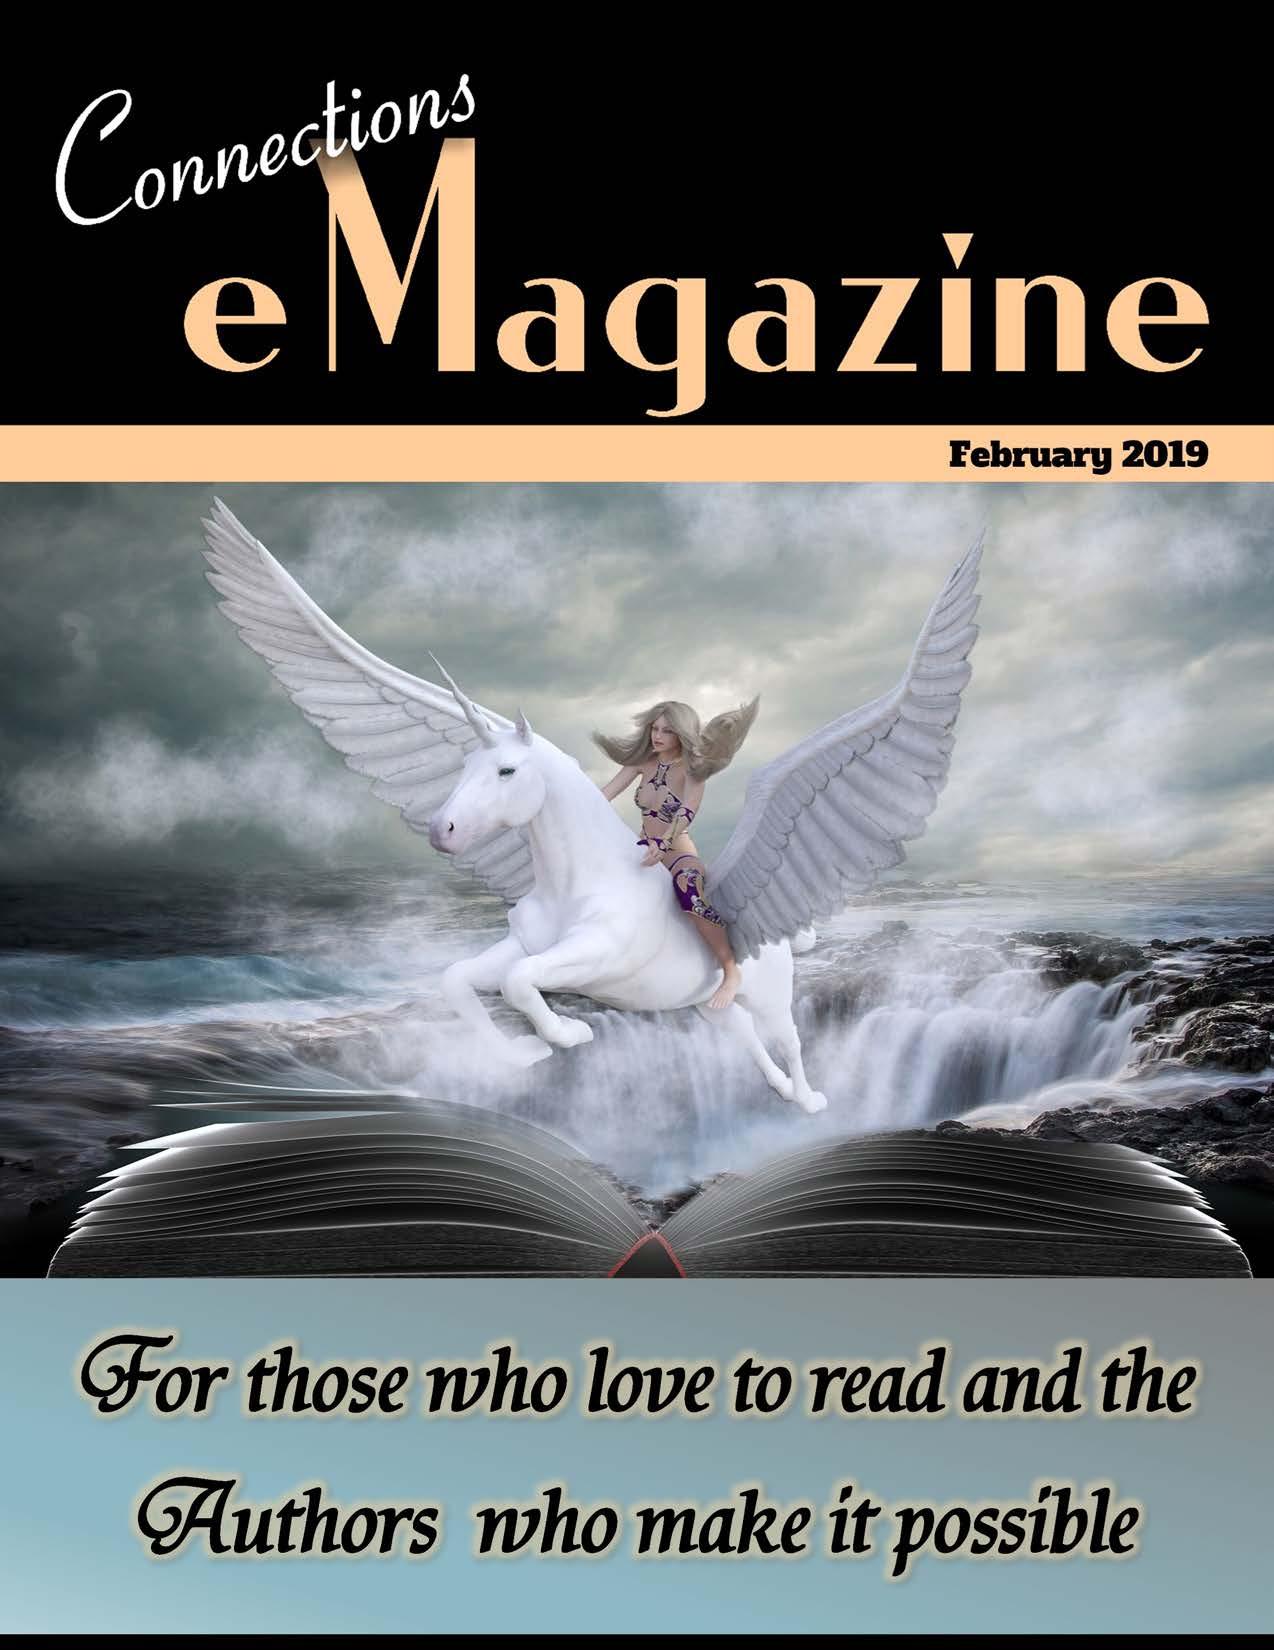 mpsmith-publishing-connections-emagazine-february-2019_Page_001.jpg